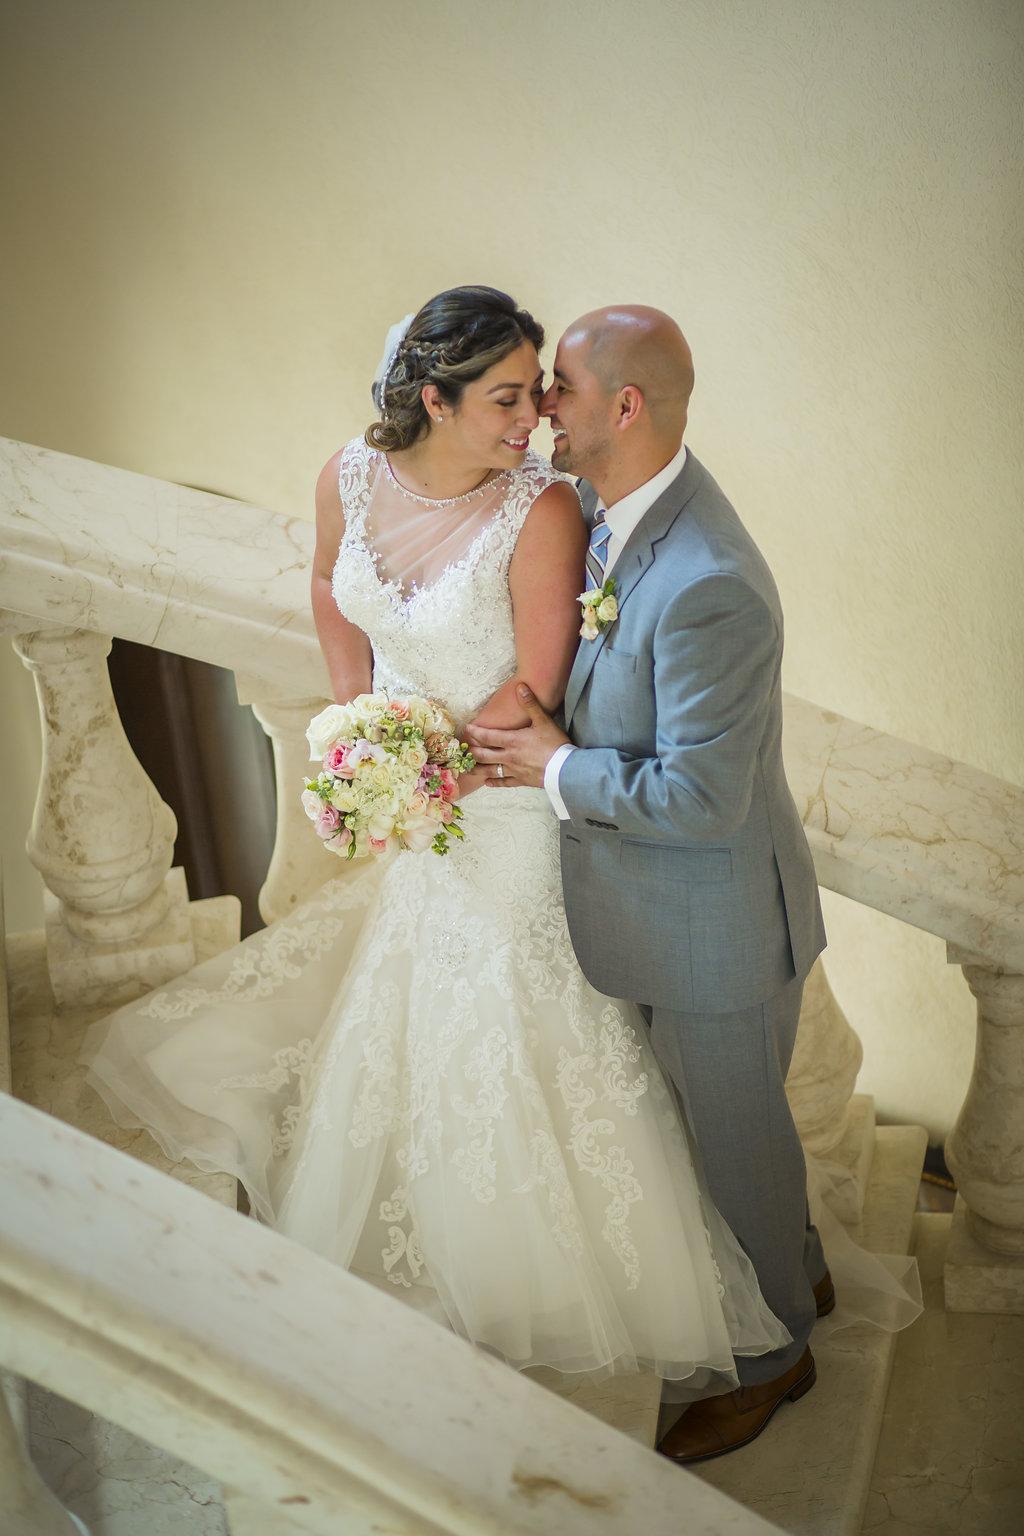 yesica-jose-beach-wedding-Villa-La-Joya--Playa-del-carmen-01--21.jpg